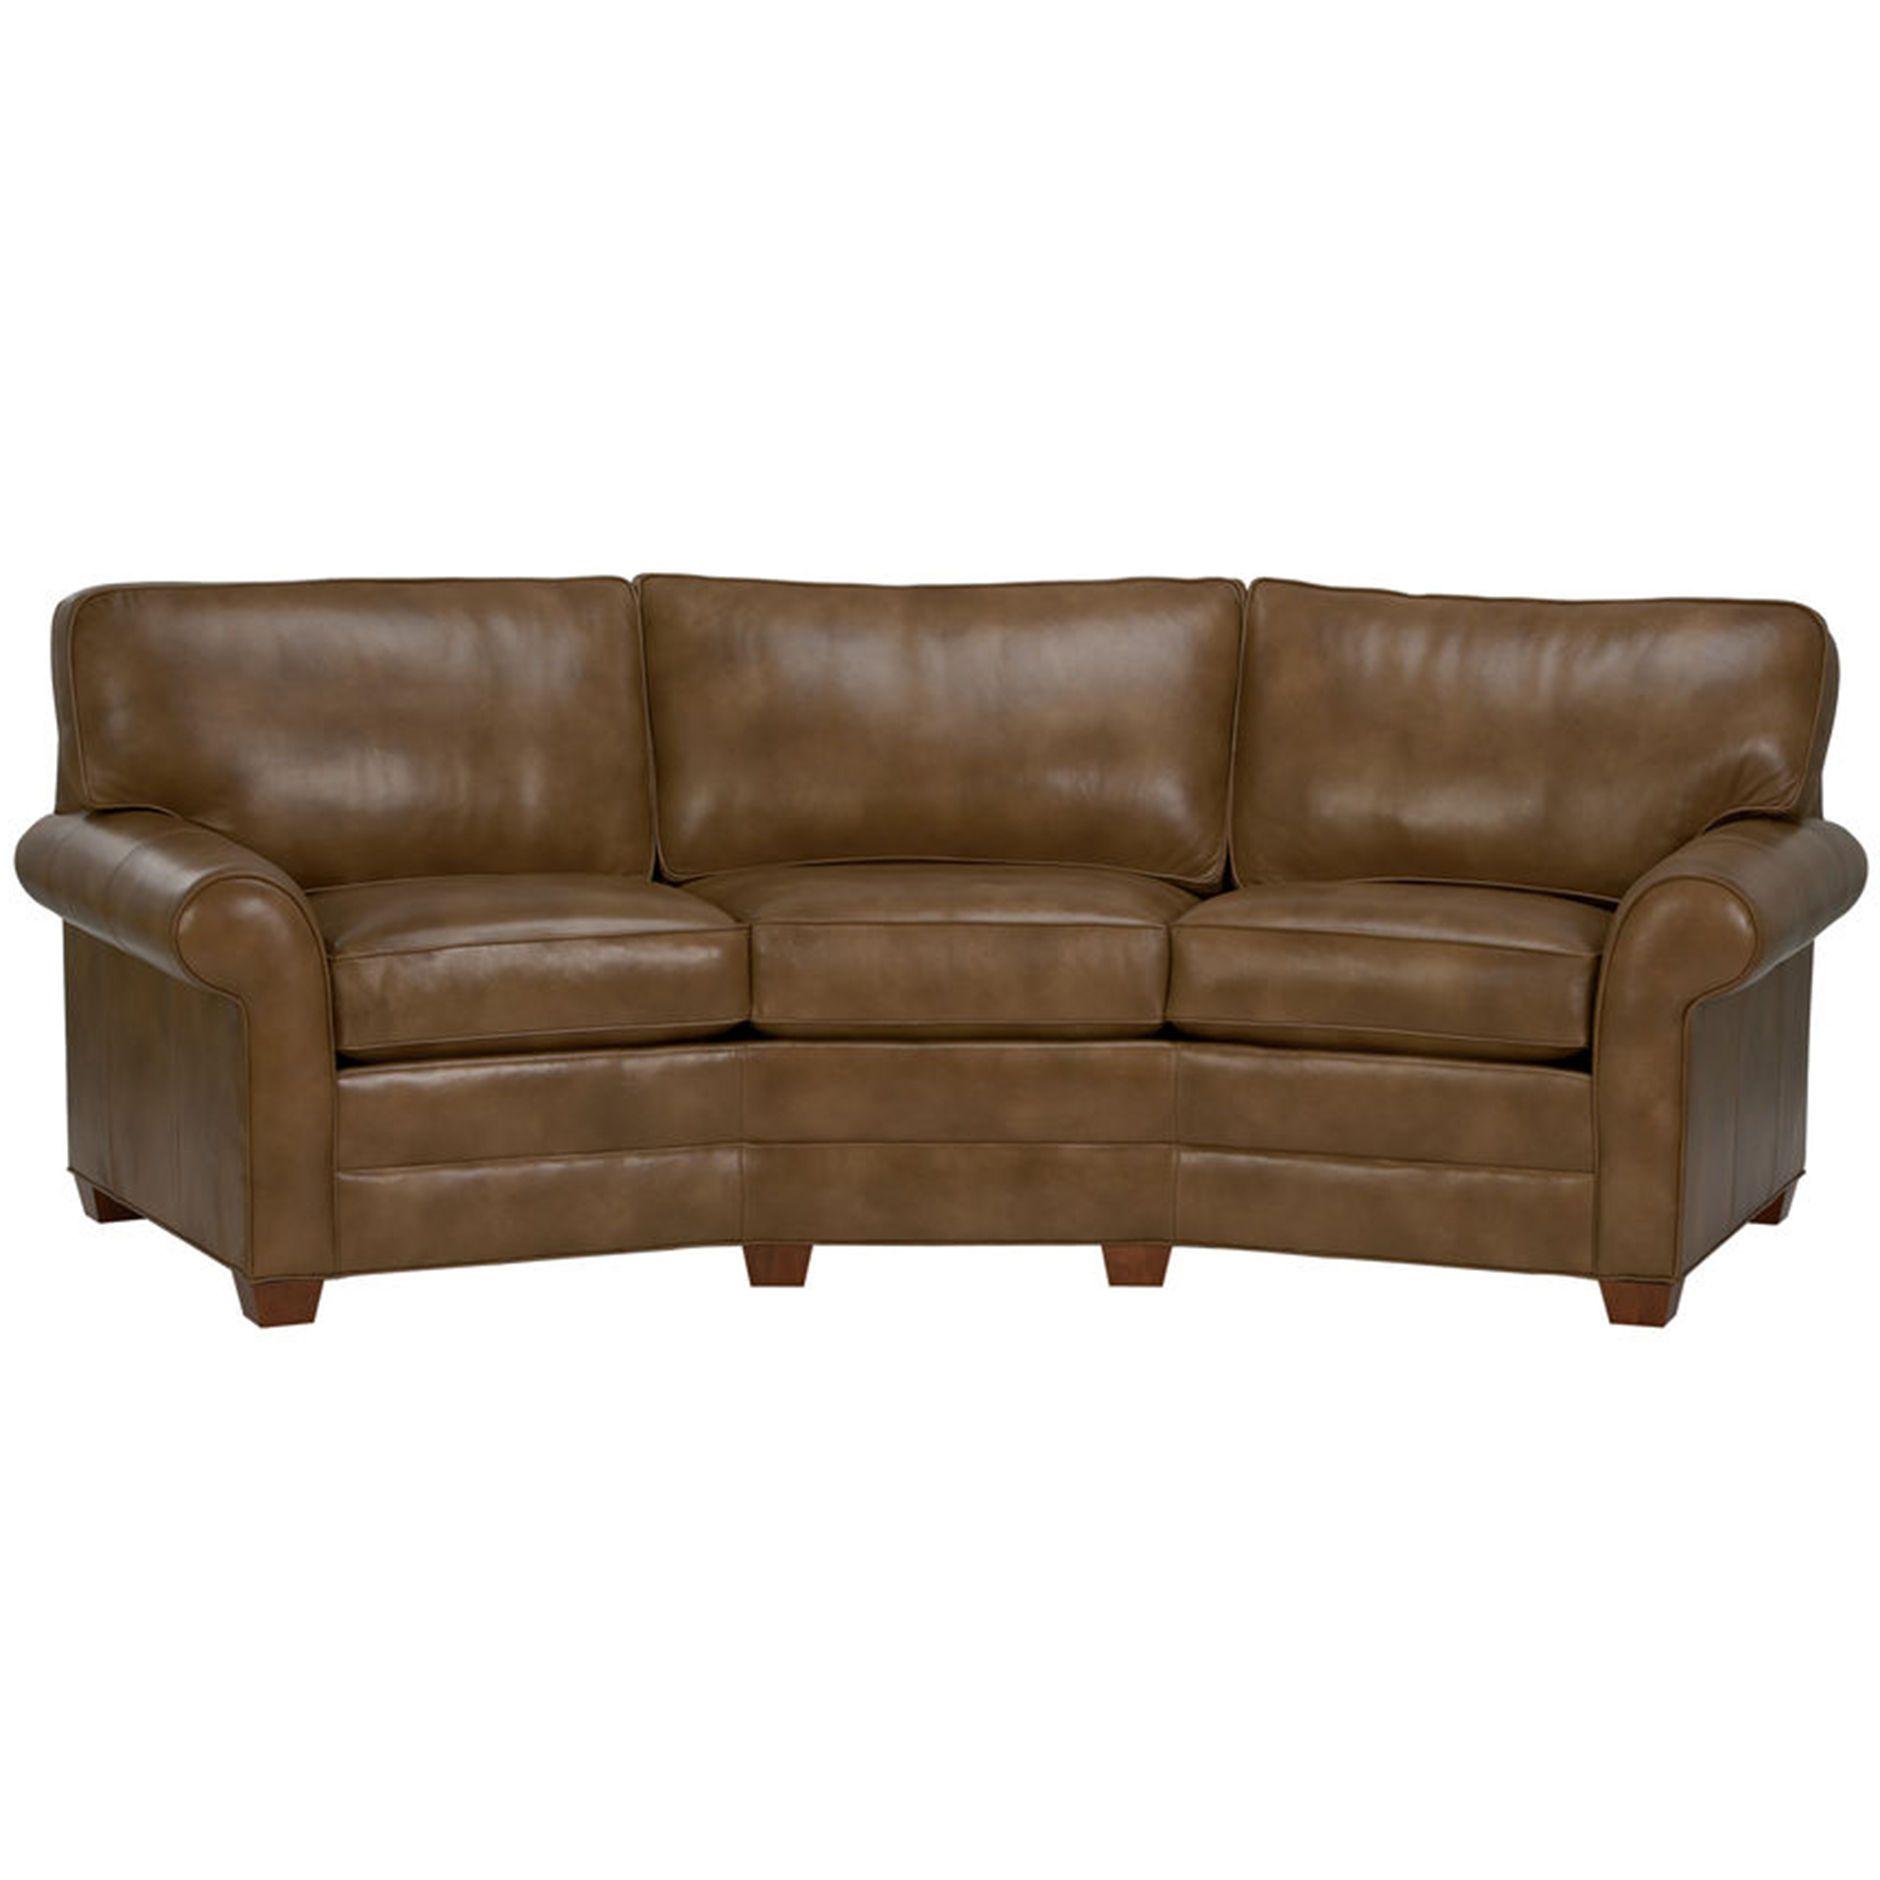 Bennett Roll Arm Conversation Leather Sofa   Ethan Allen US